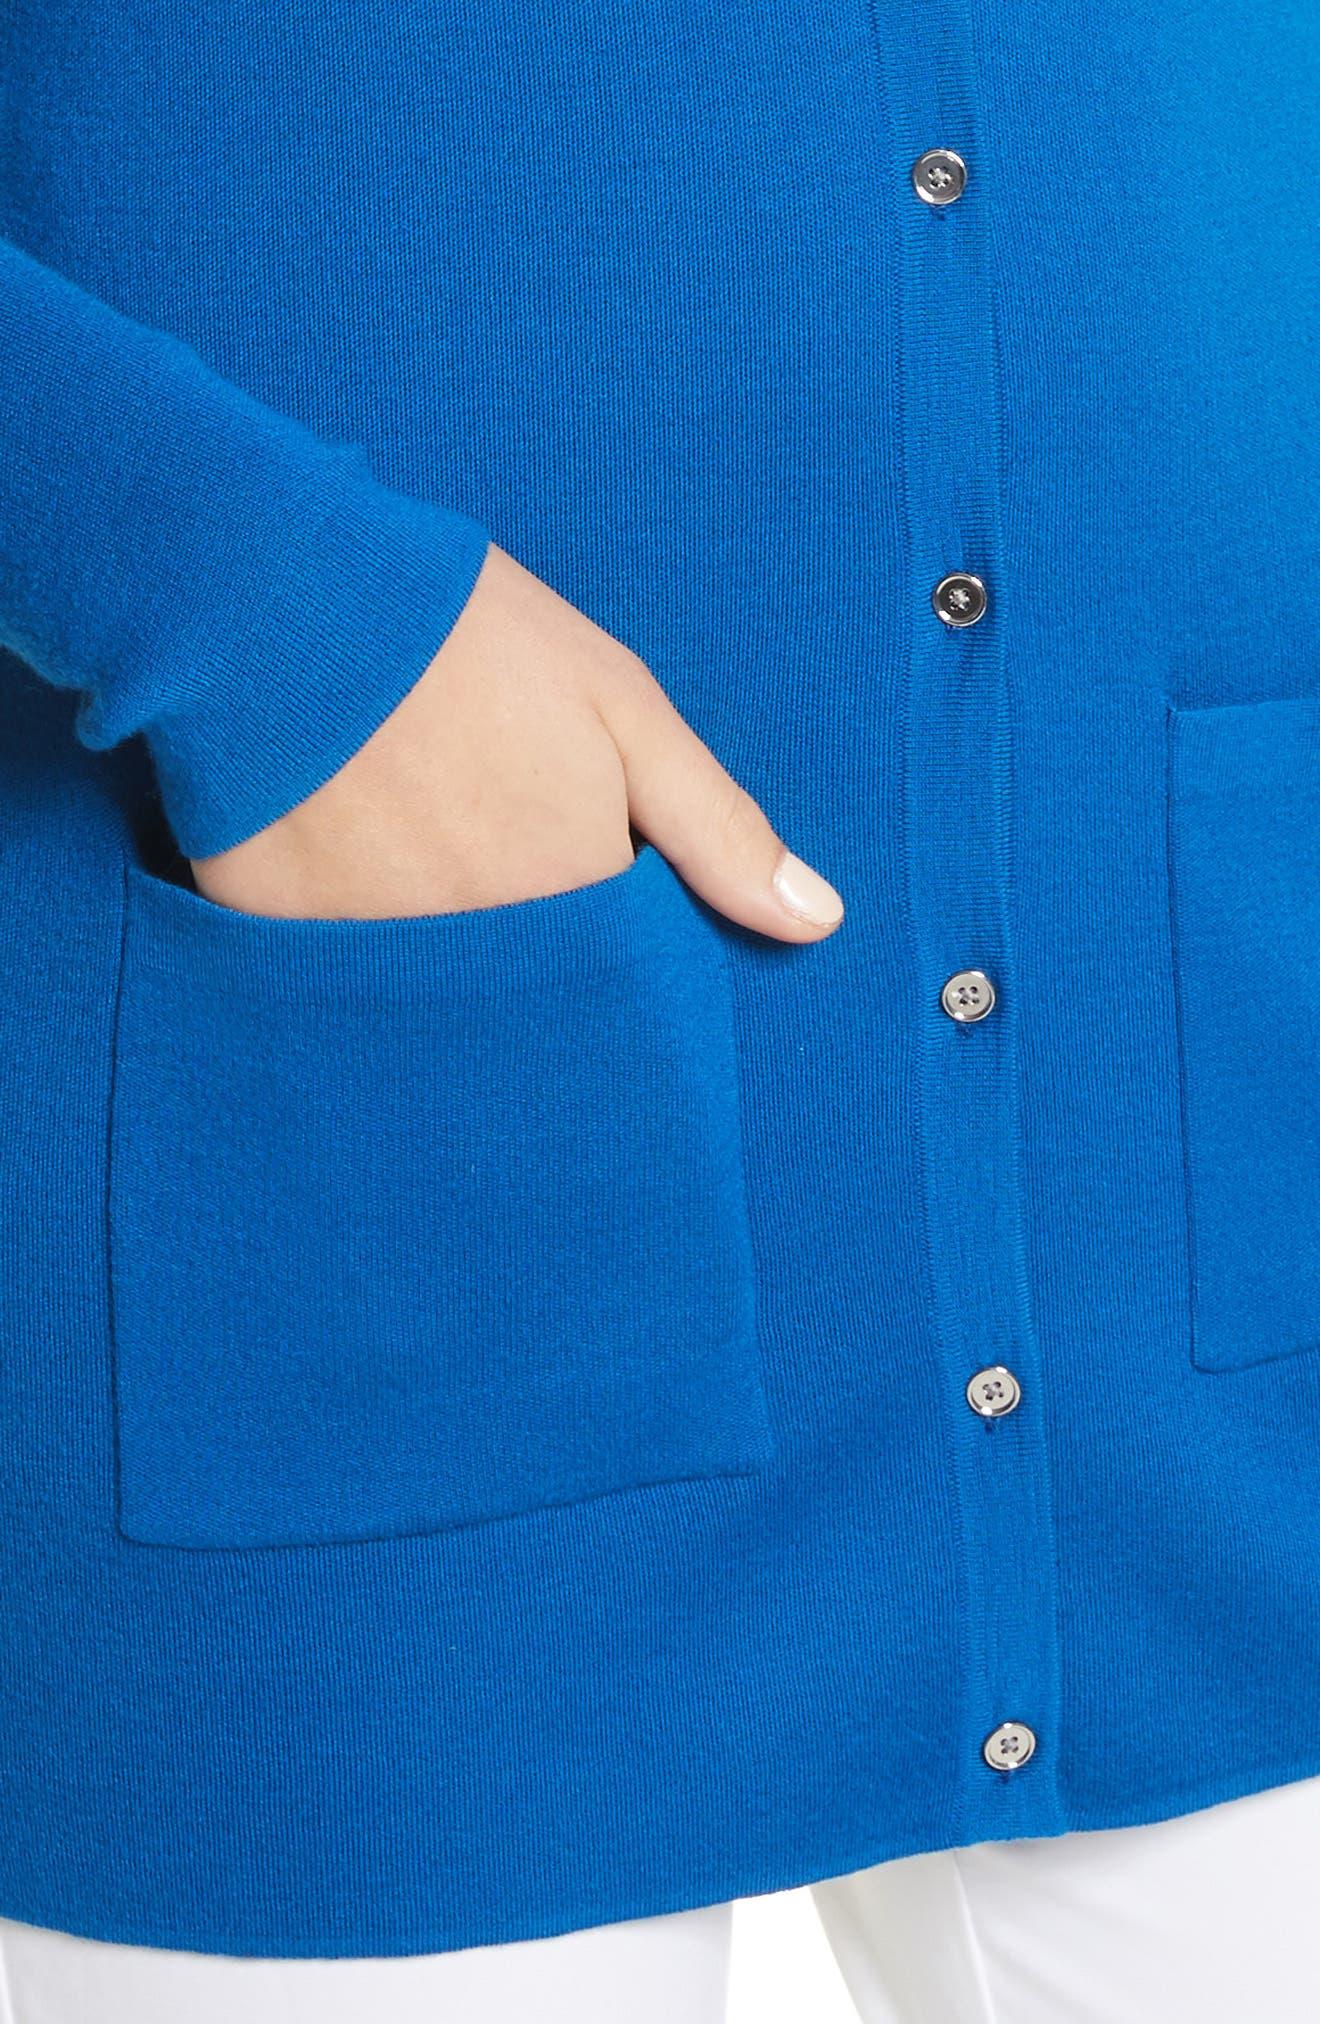 Long Cashmere Cardigan,                             Alternate thumbnail 4, color,                             Mediterranean